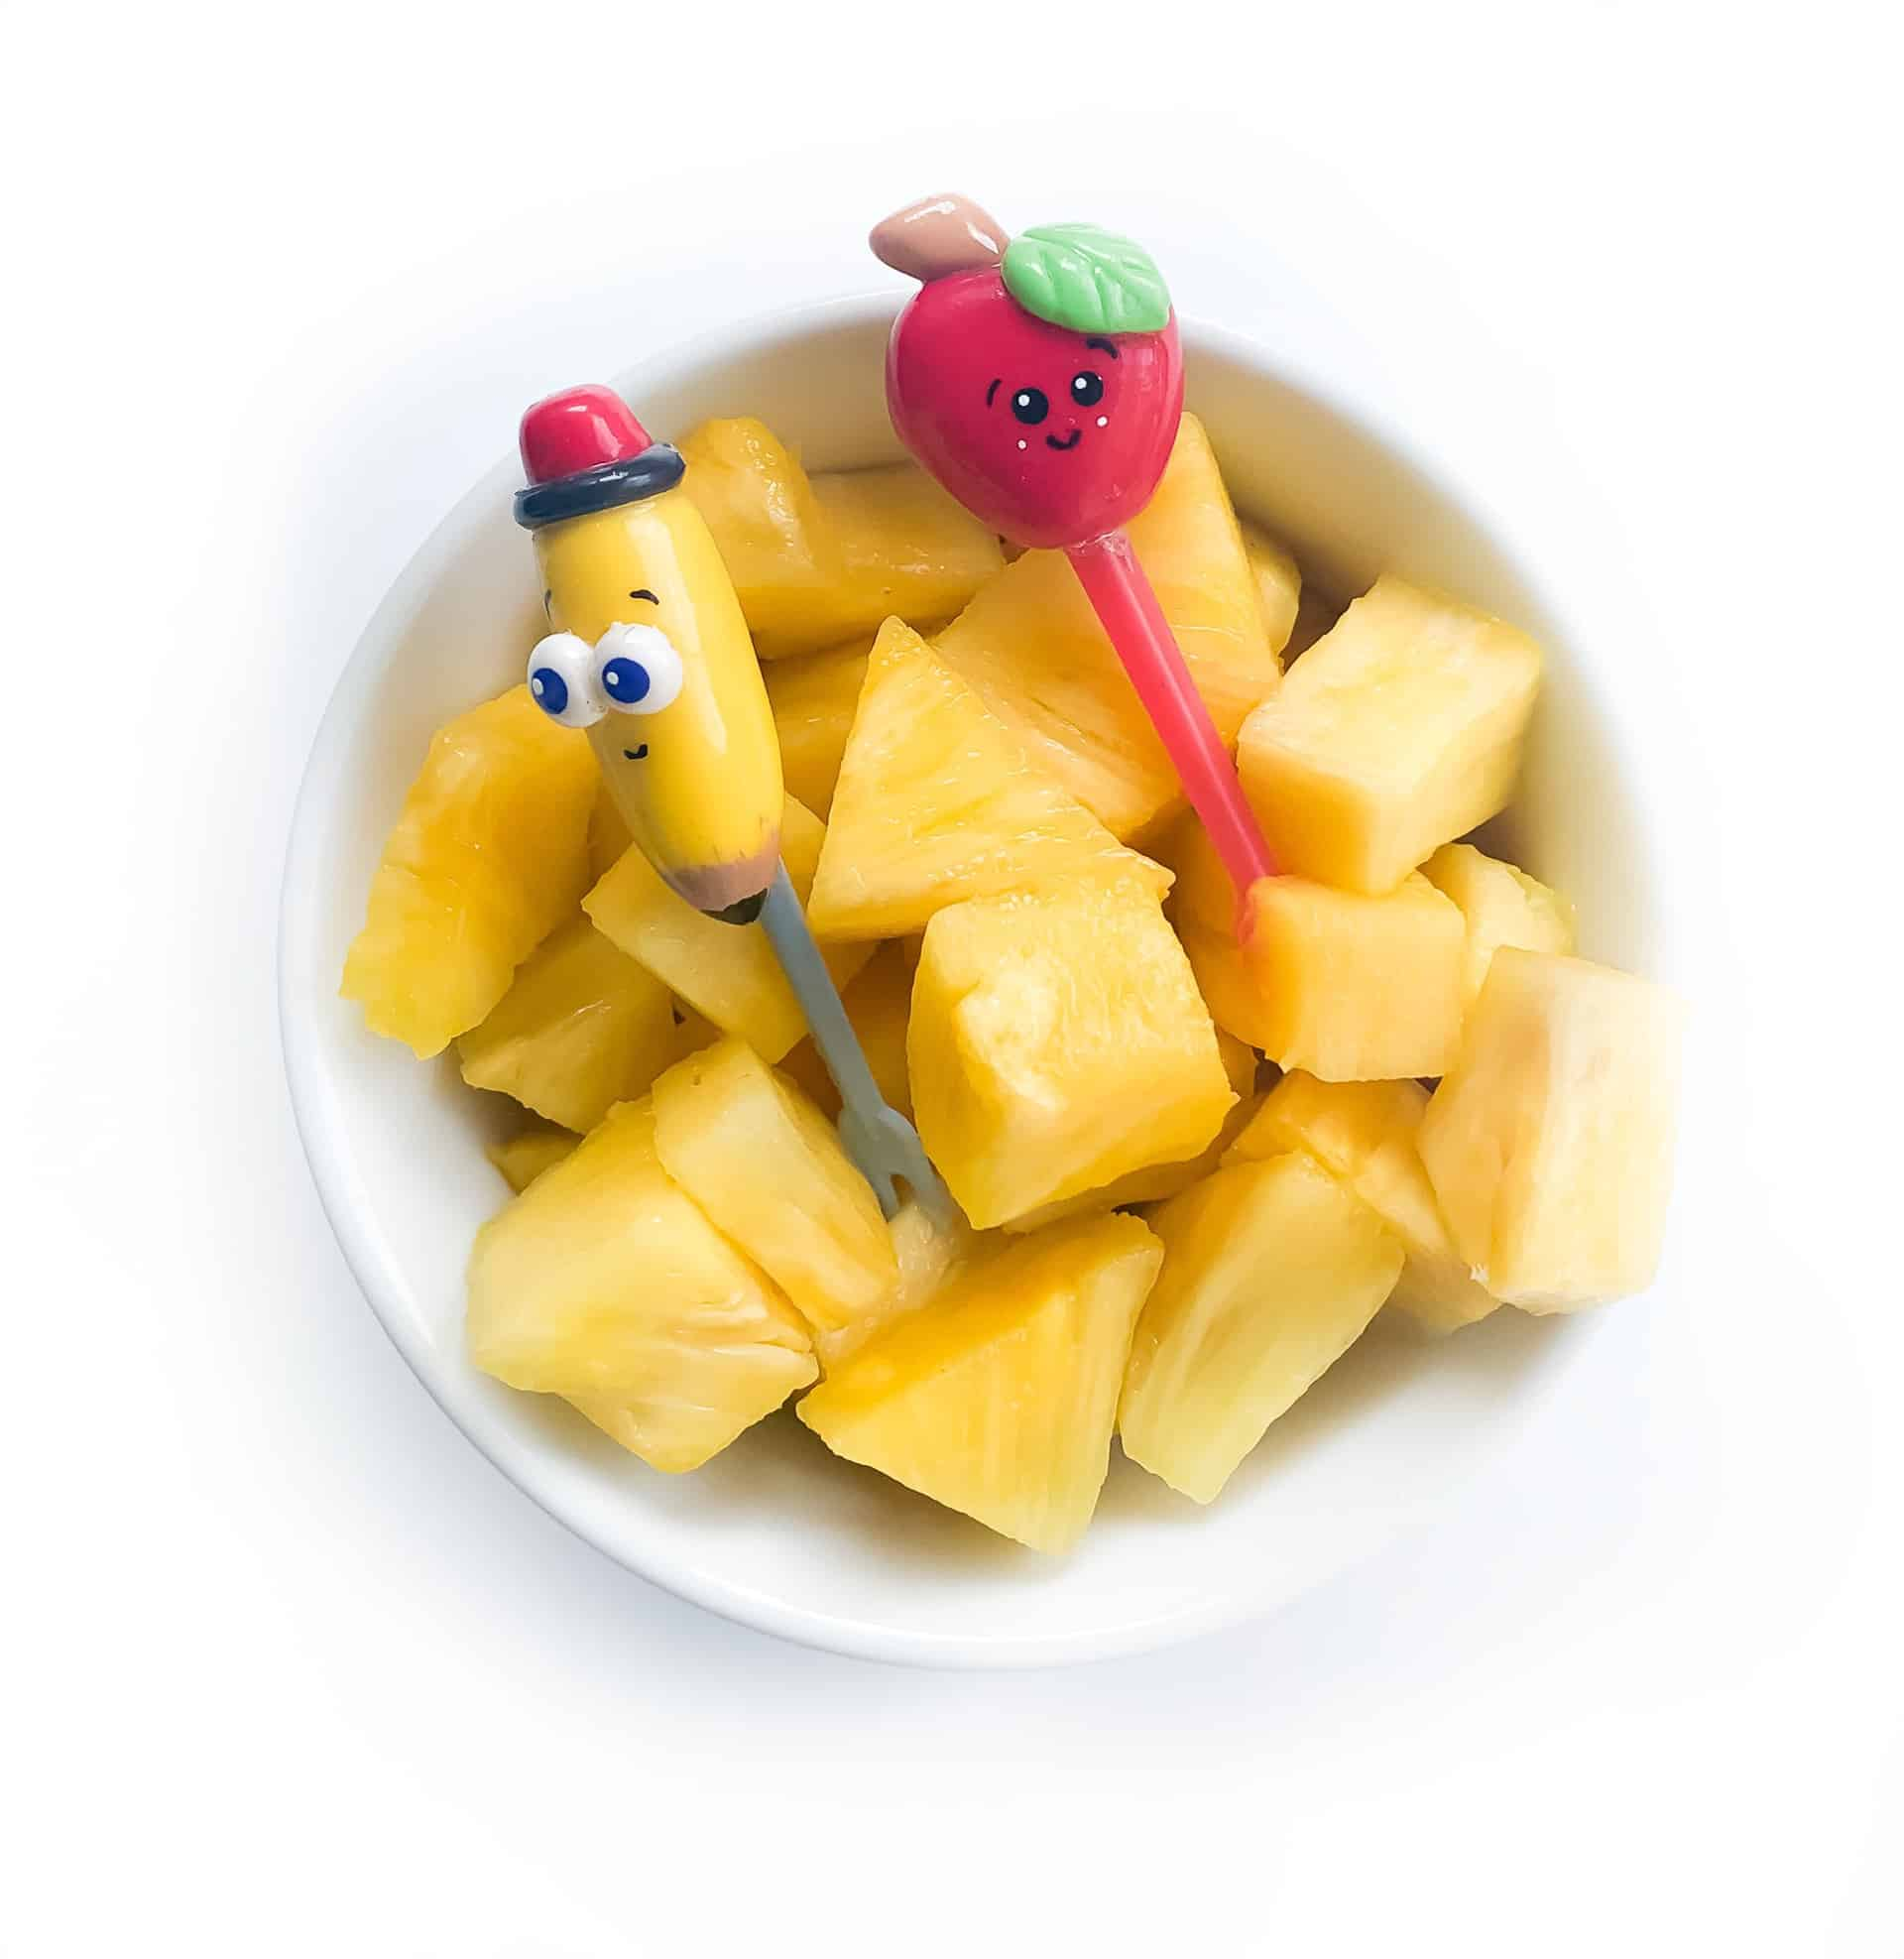 Healthy Team Snacks For Preschoolers